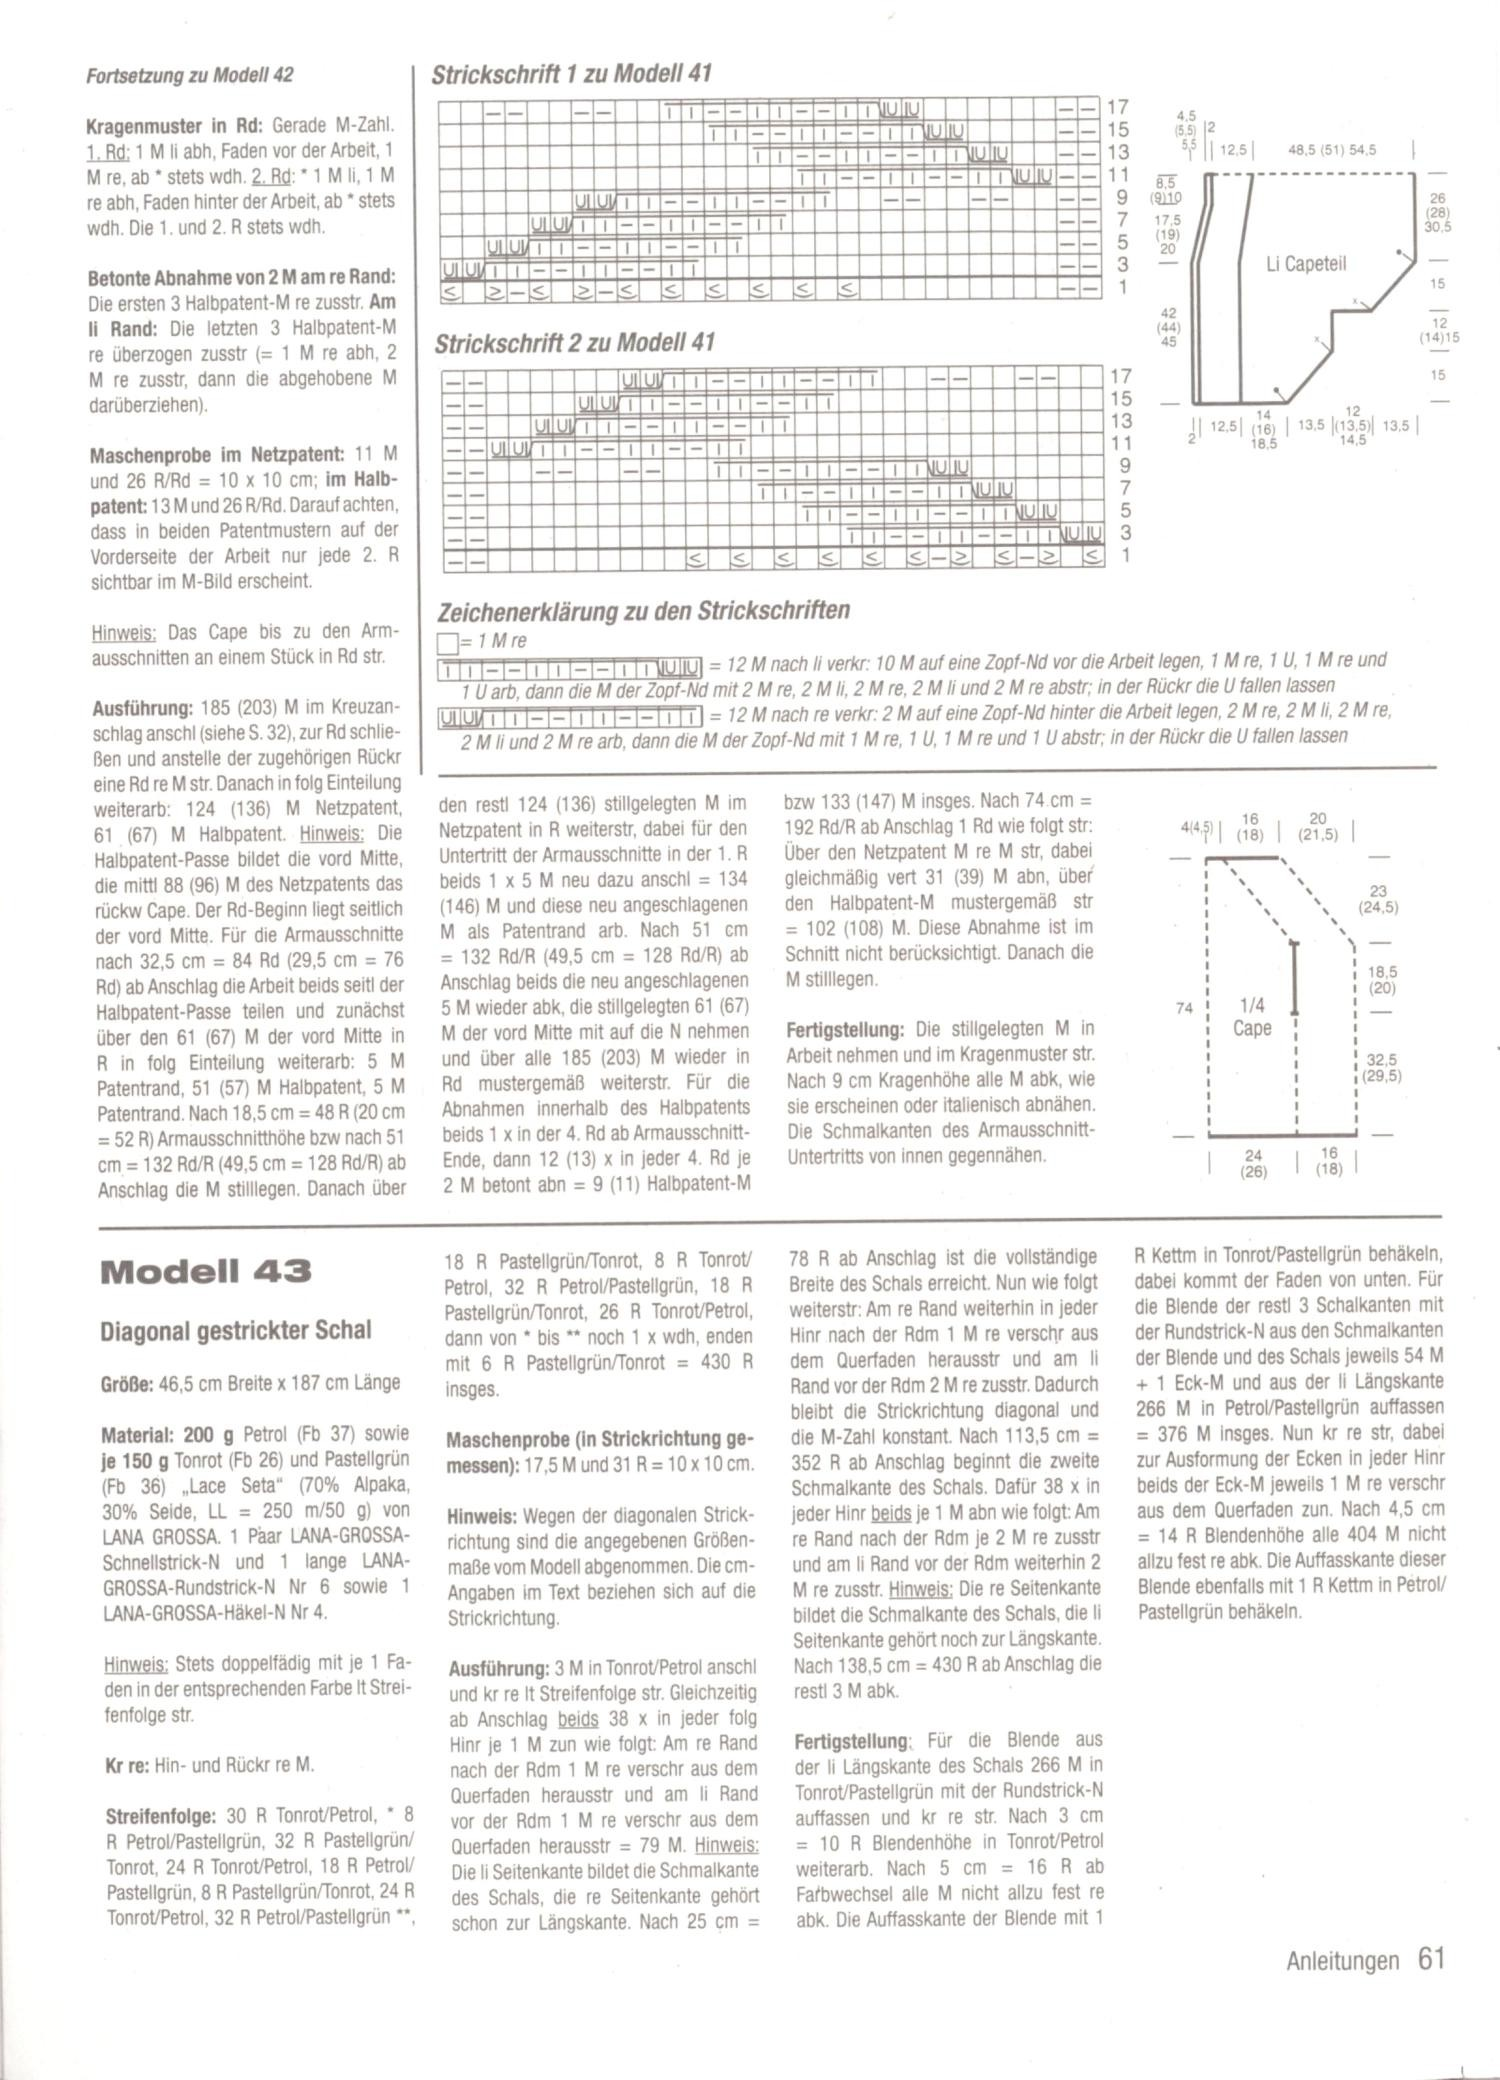 Page_00061.jpg